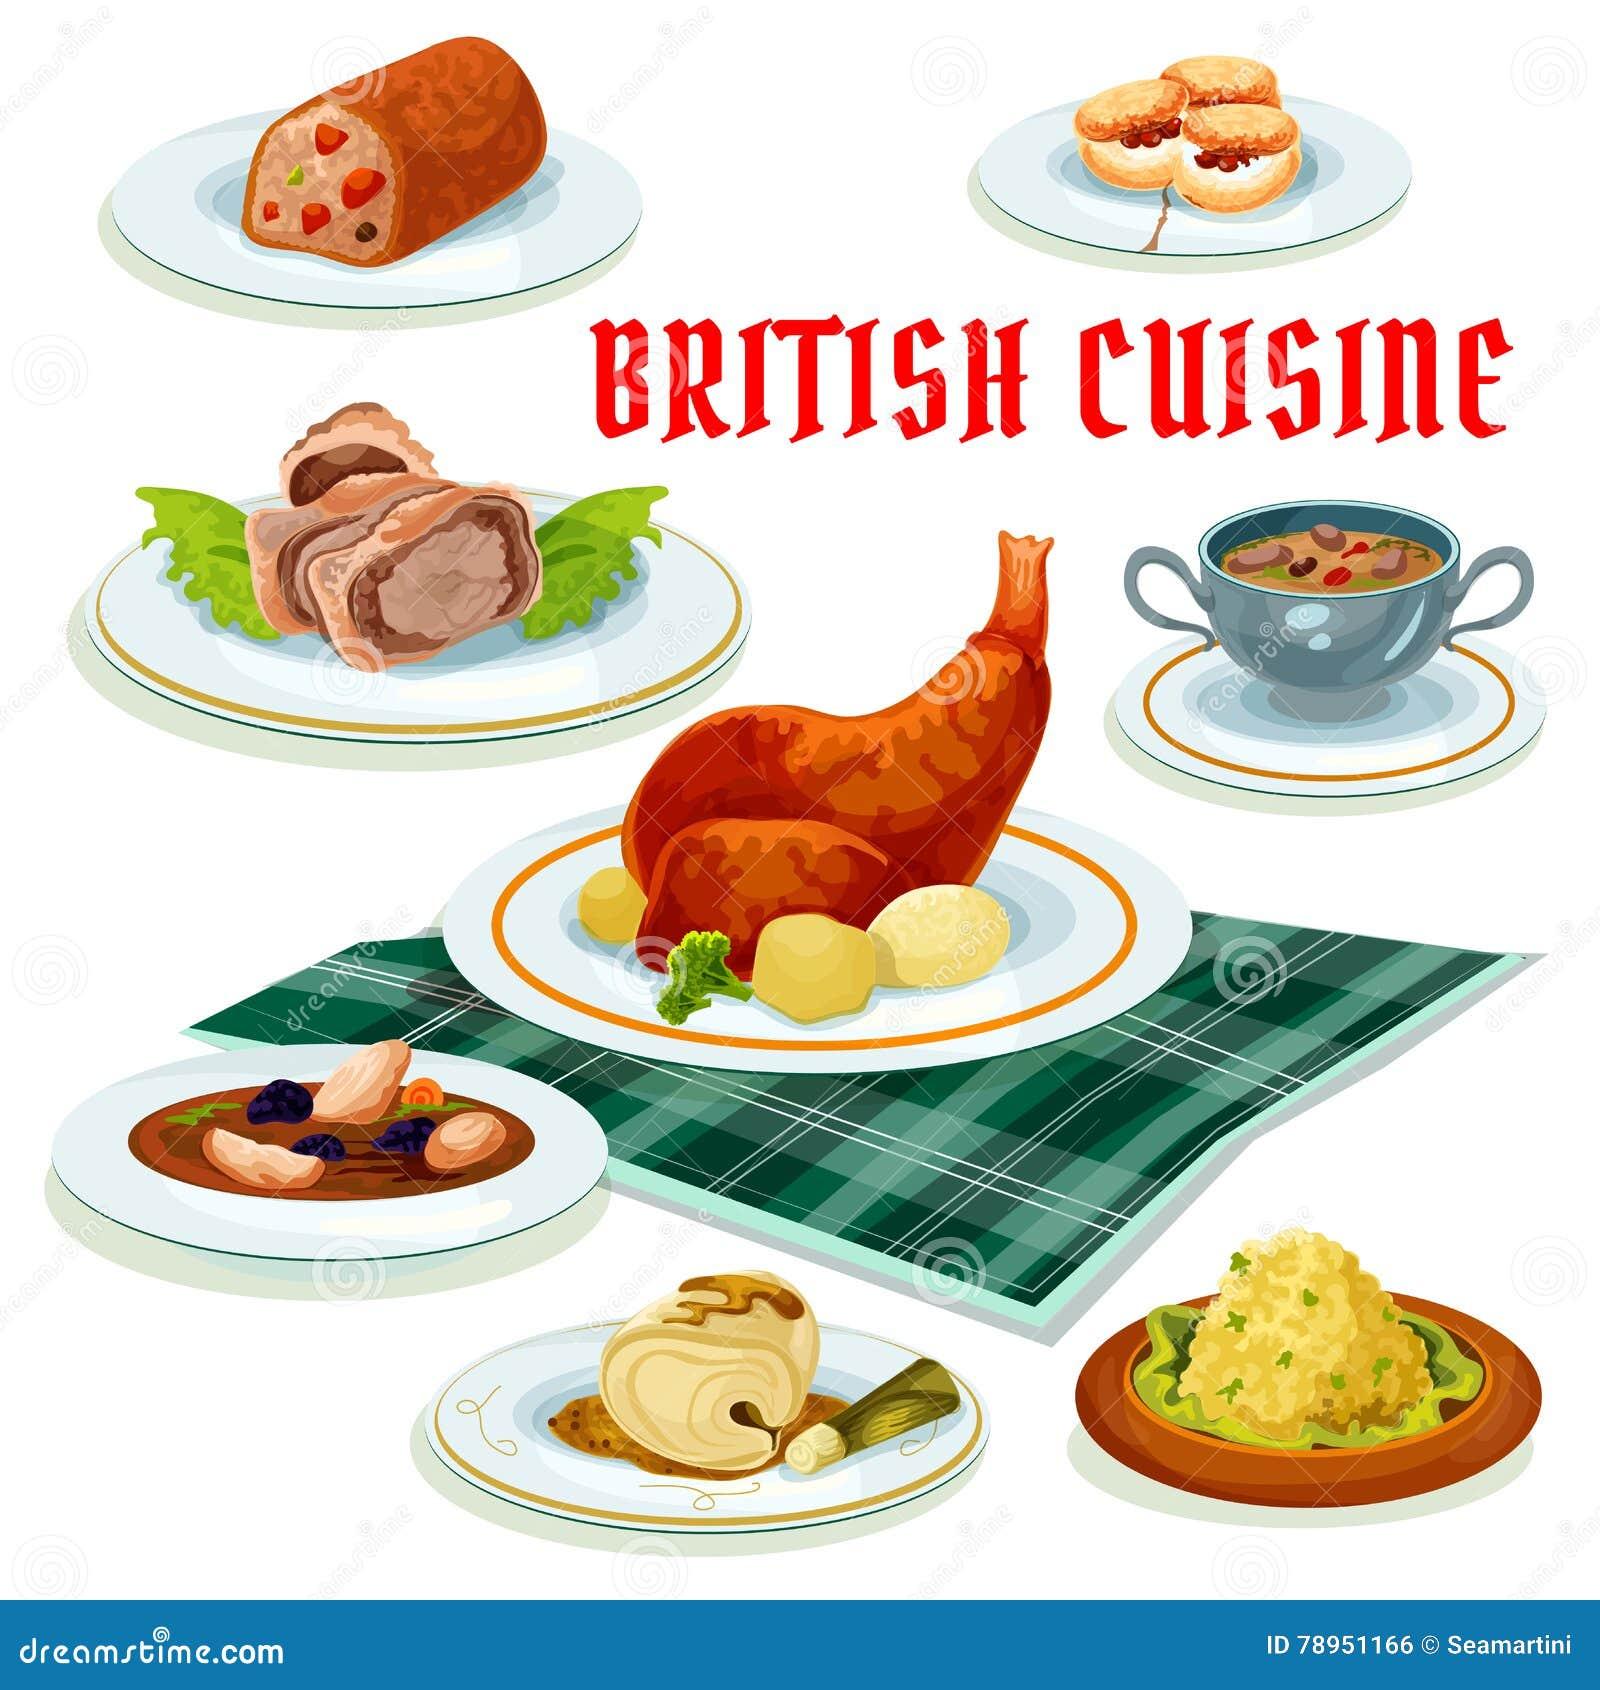 british cuisine cartoon icon for restaurant design stock vector illustration of menu dinner. Black Bedroom Furniture Sets. Home Design Ideas